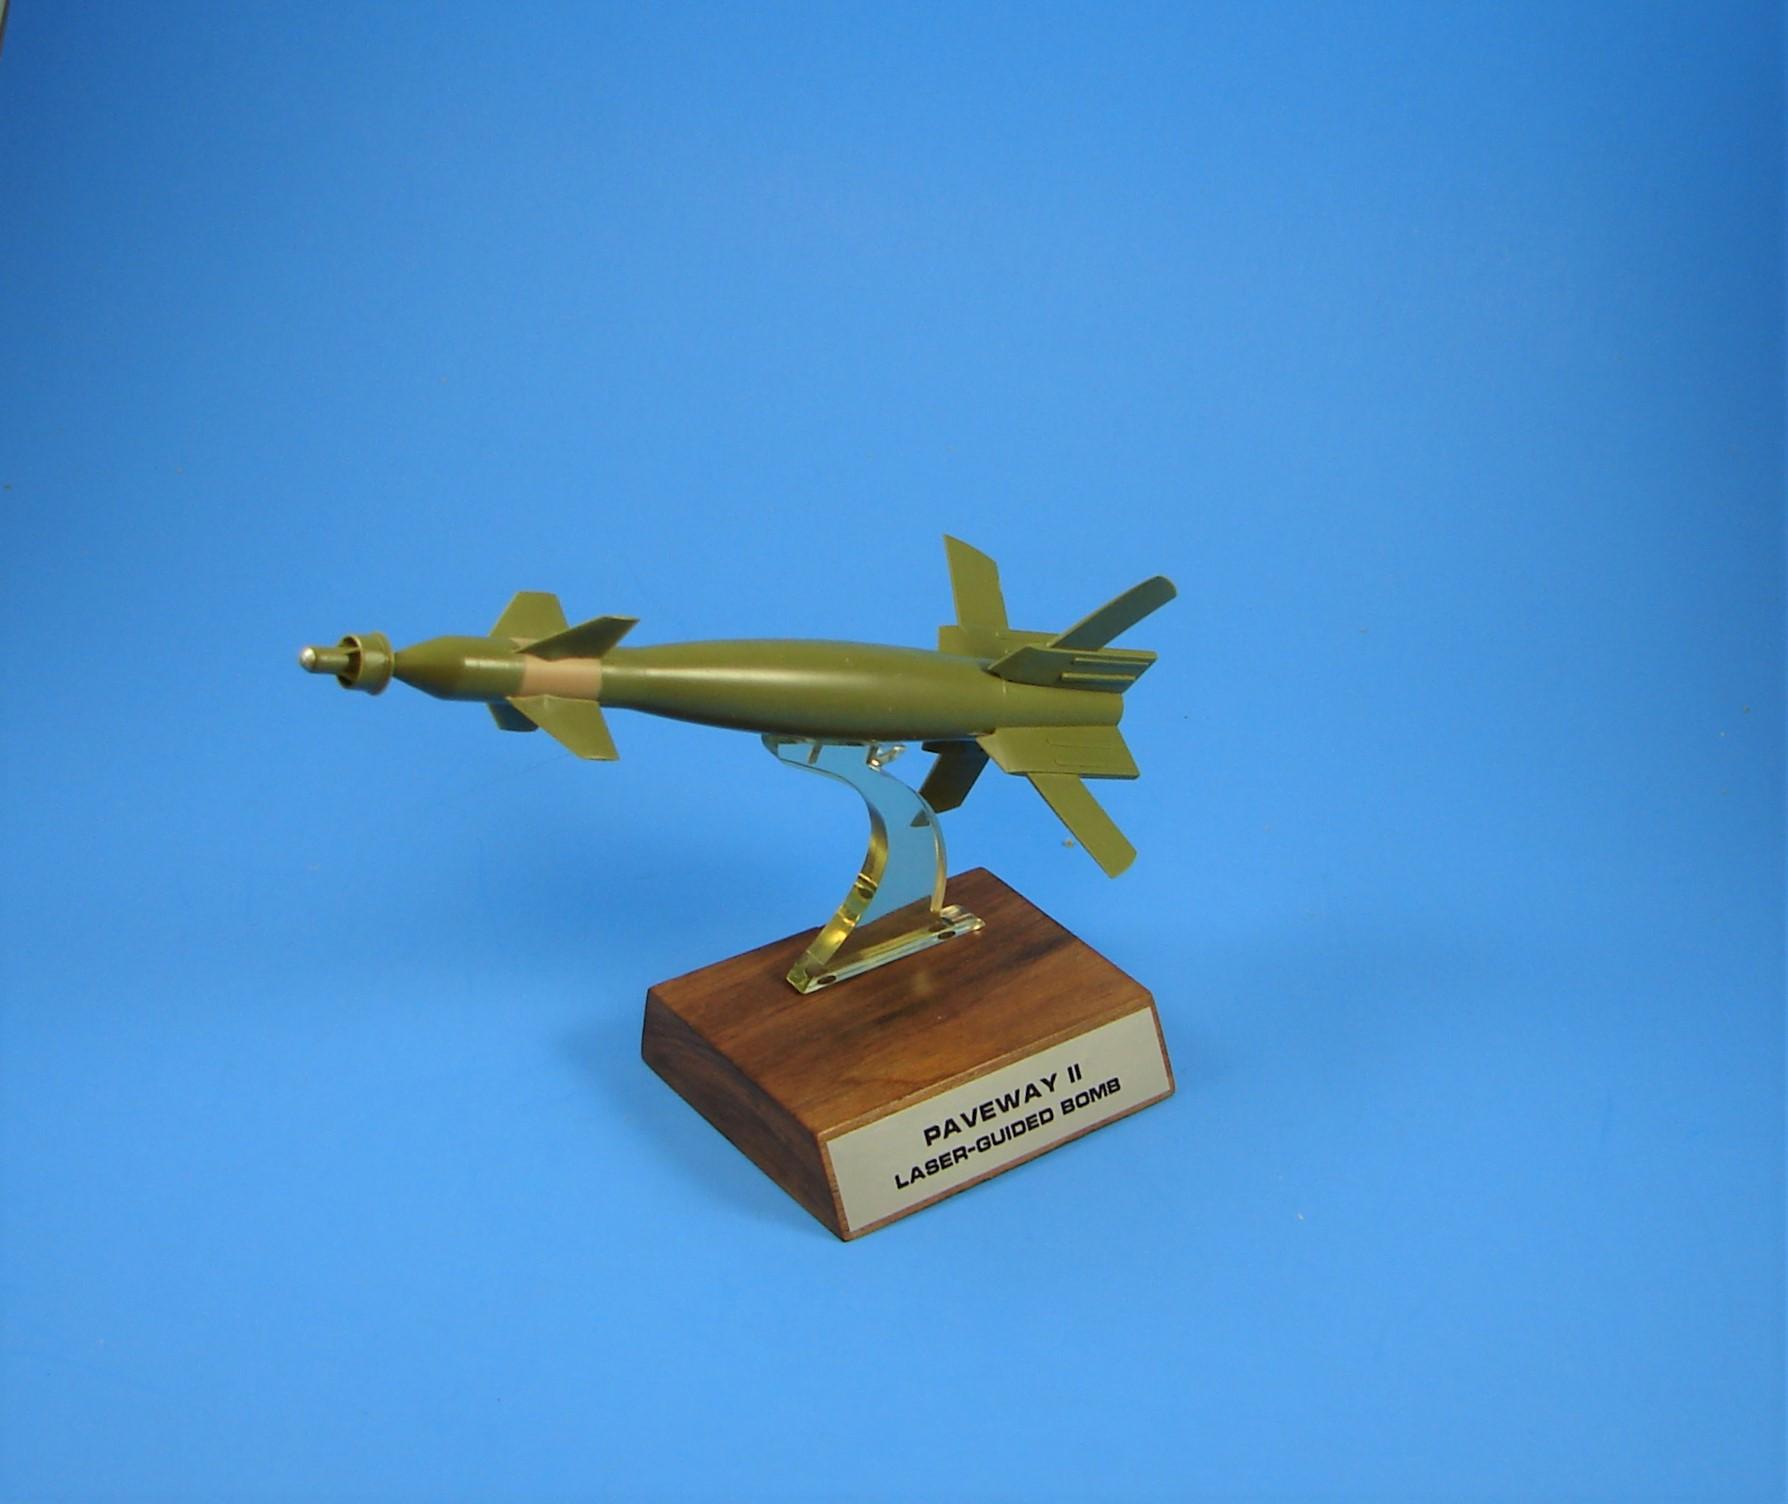 TI MK-83 Paveway II